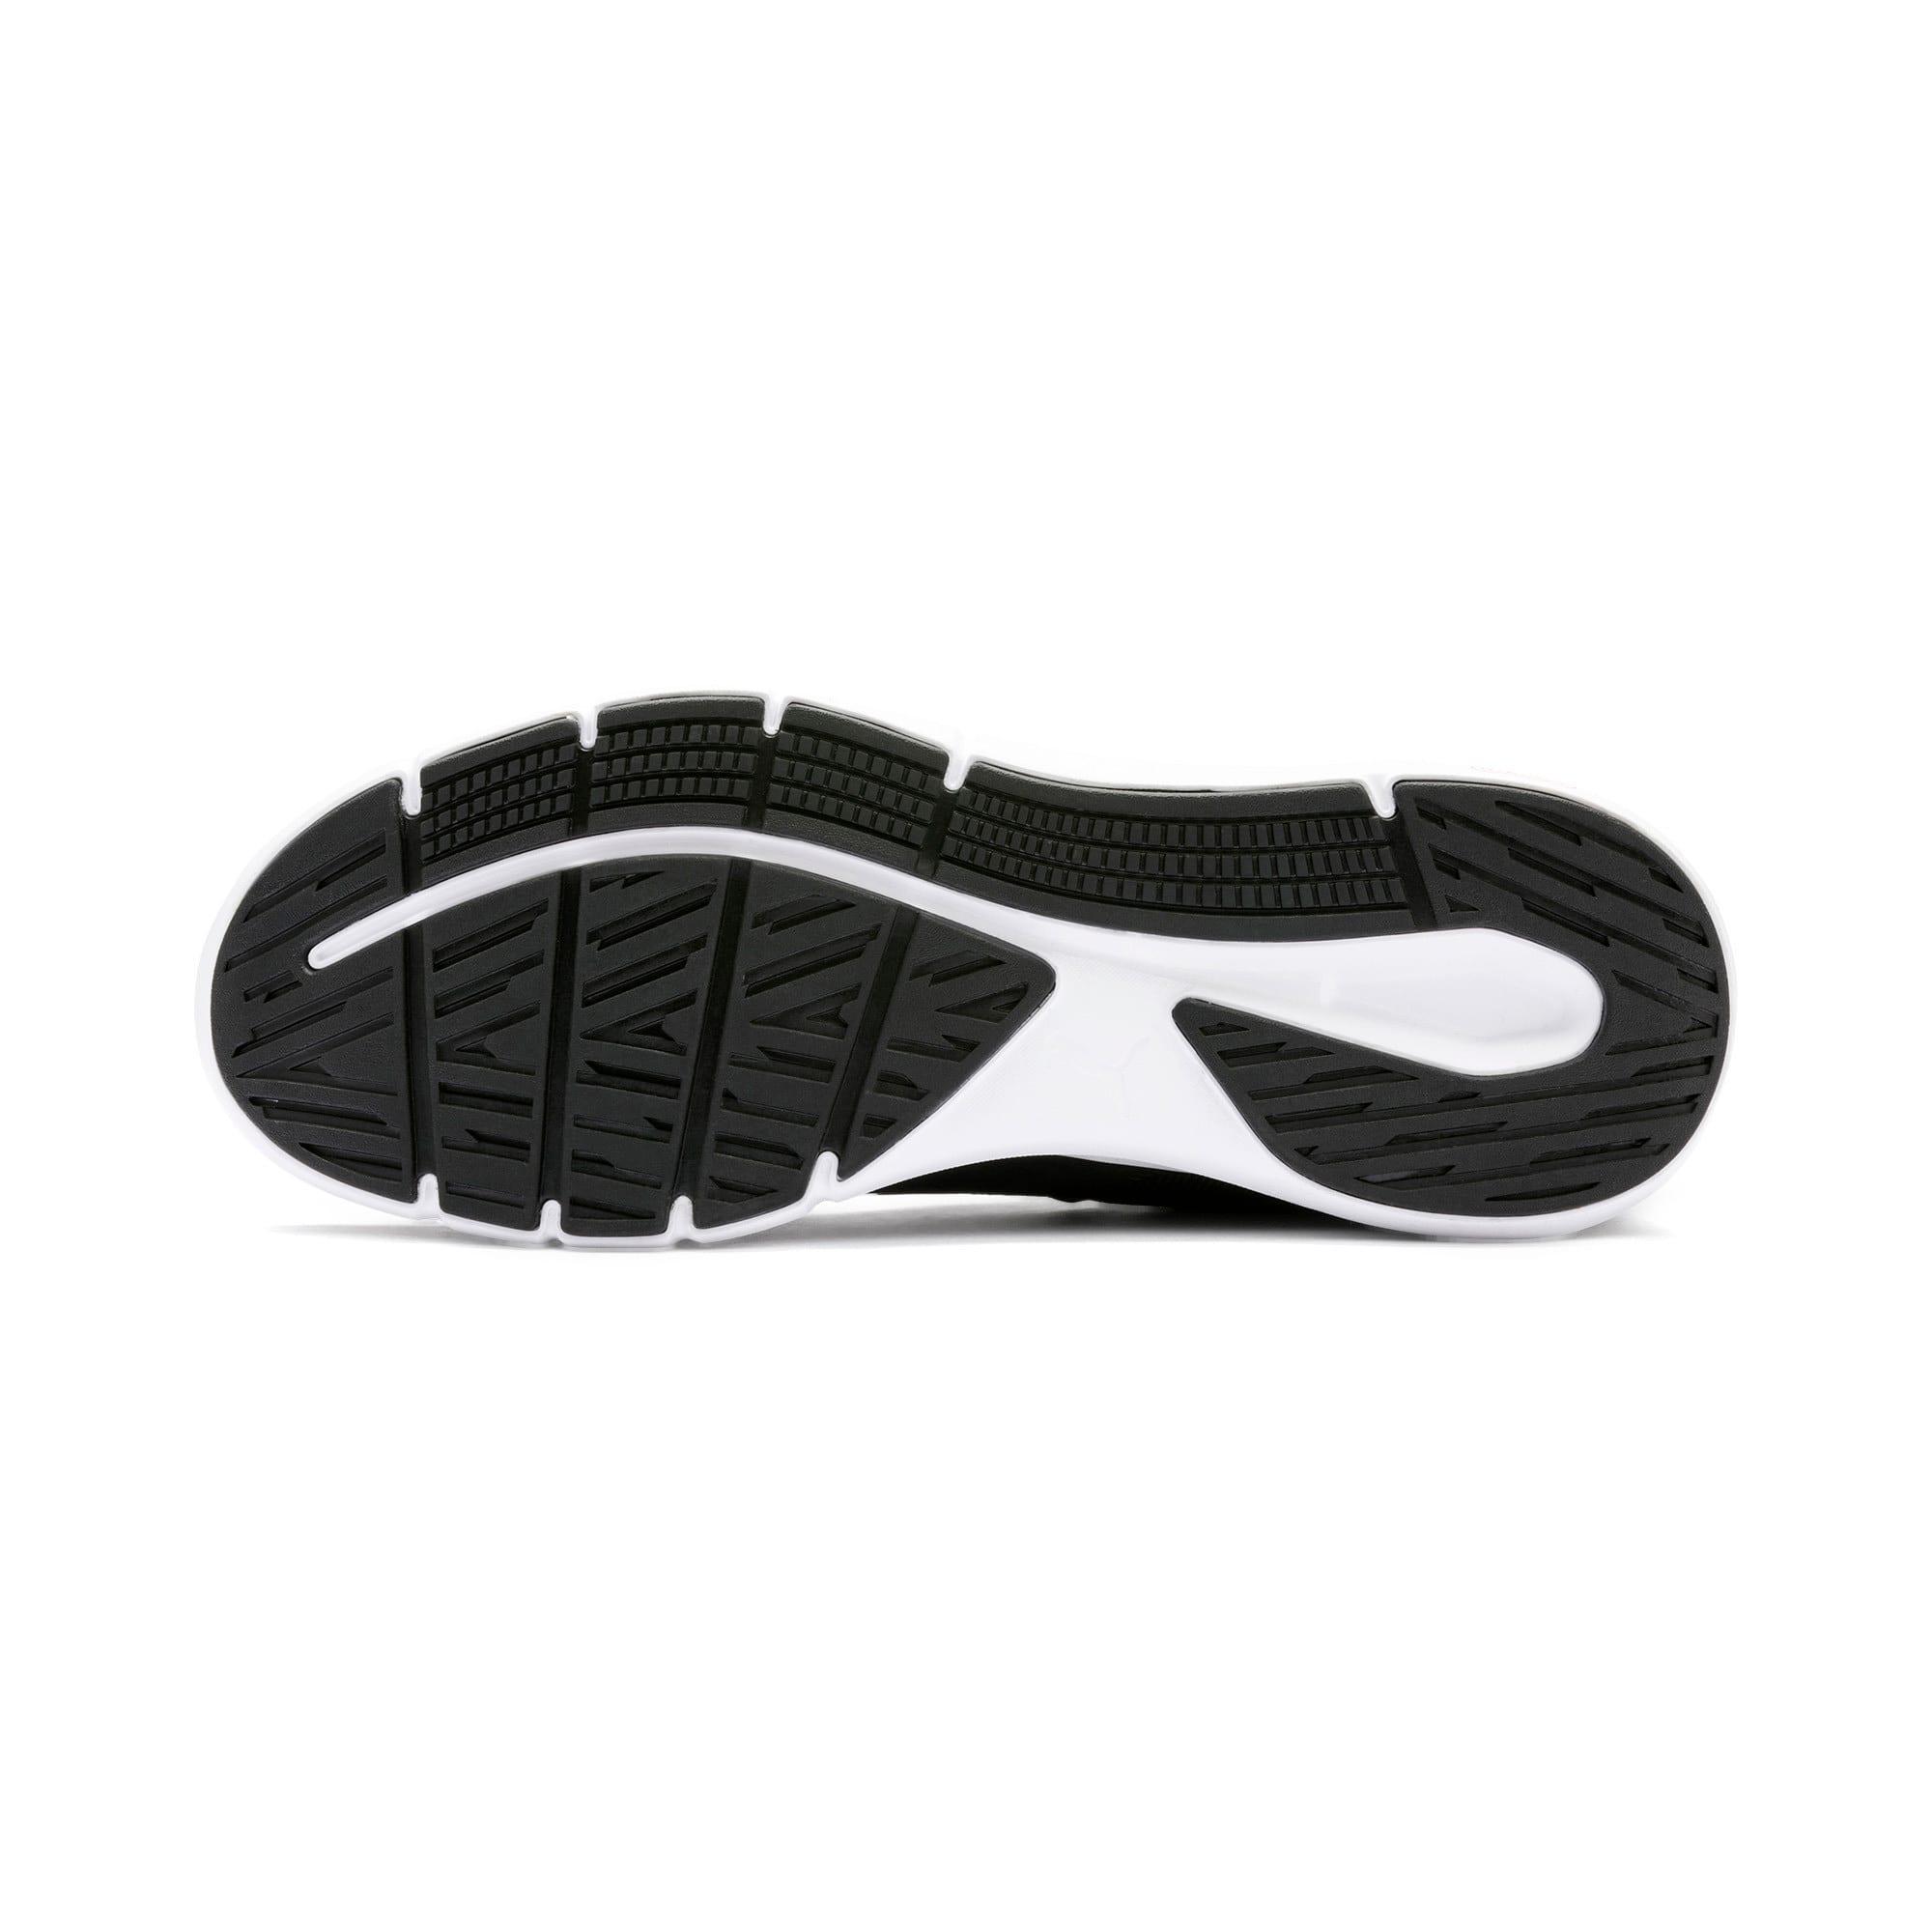 Thumbnail 4 of NRGY Dynamo Futuro Men's Running Shoes, Puma Black-Nrgy Red, medium